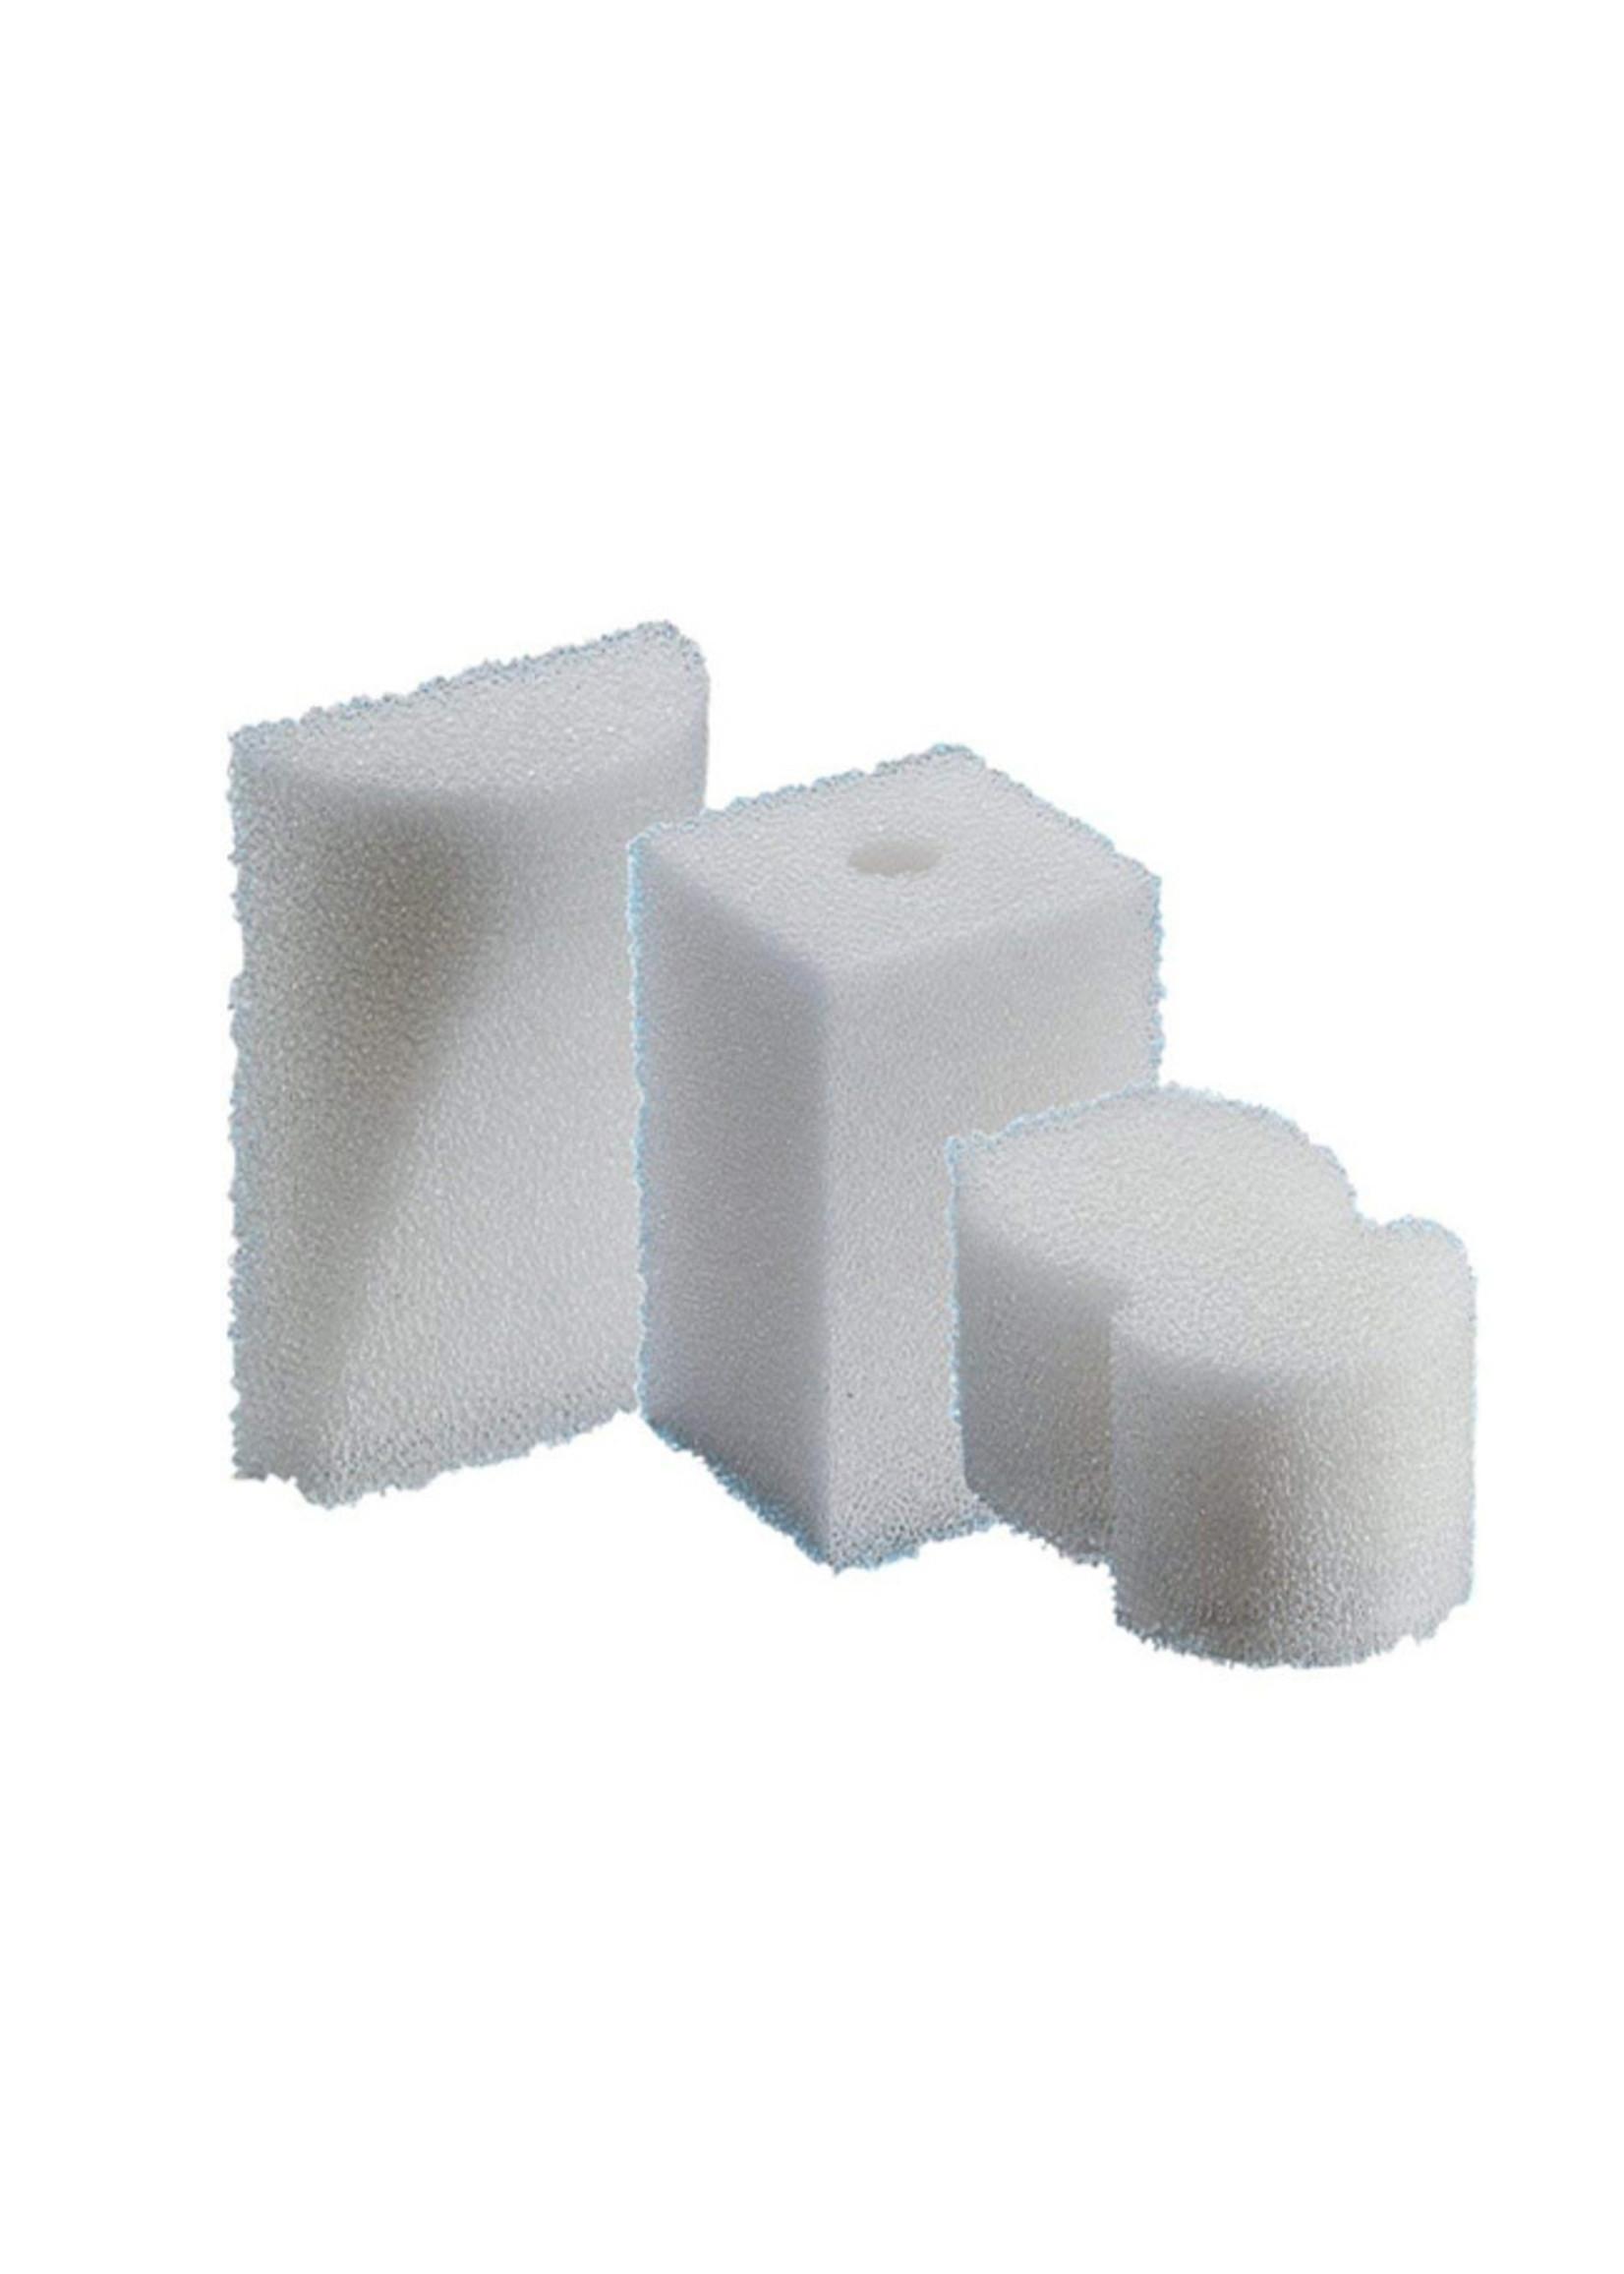 OASE OASE FiltoSmart Replacement Foam Set